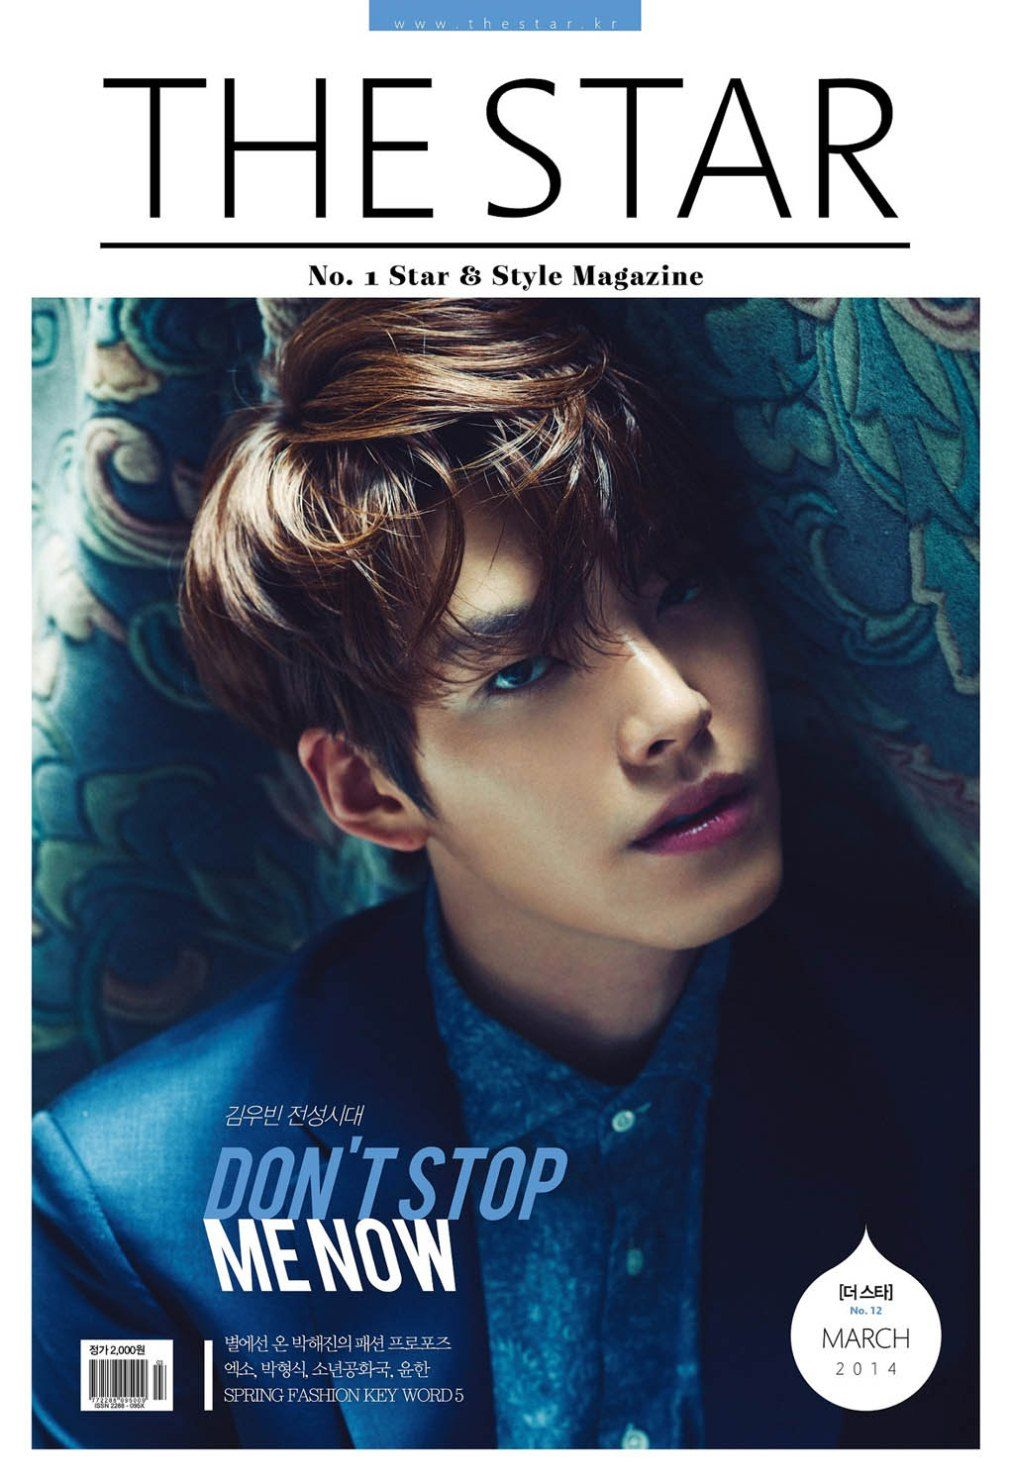 Kim Woo Bin - The Star Magazine March Issue '14